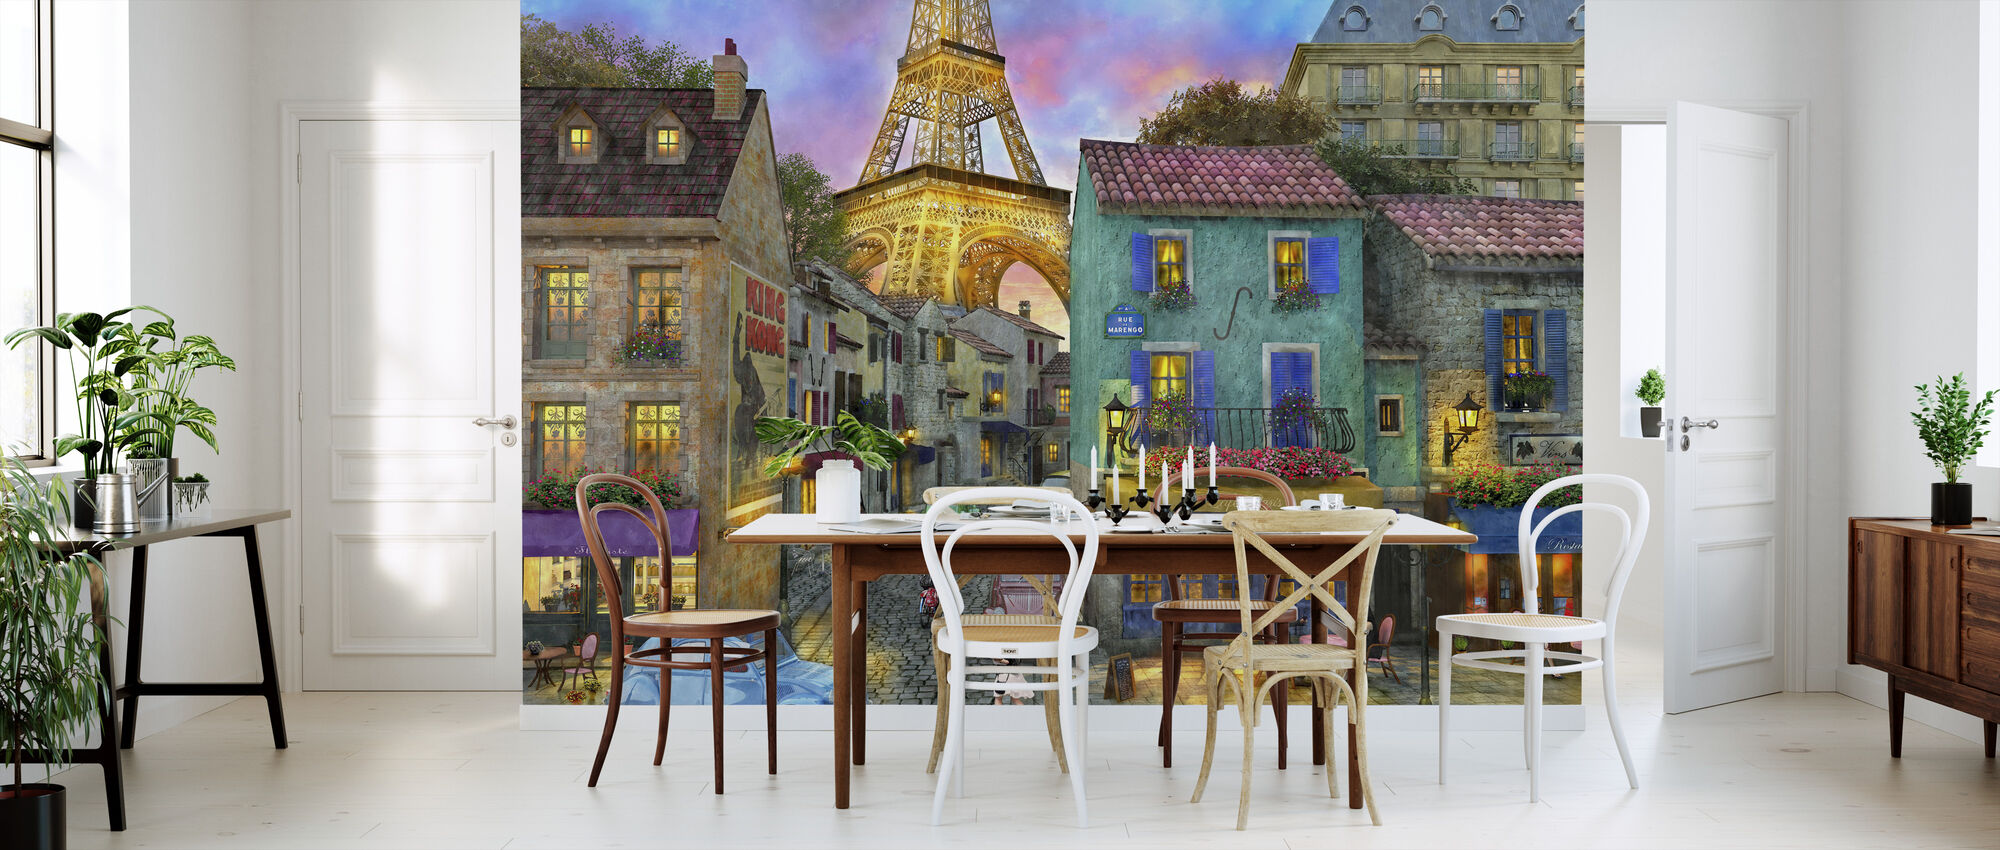 Paris Streets - Wallpaper - Kitchen